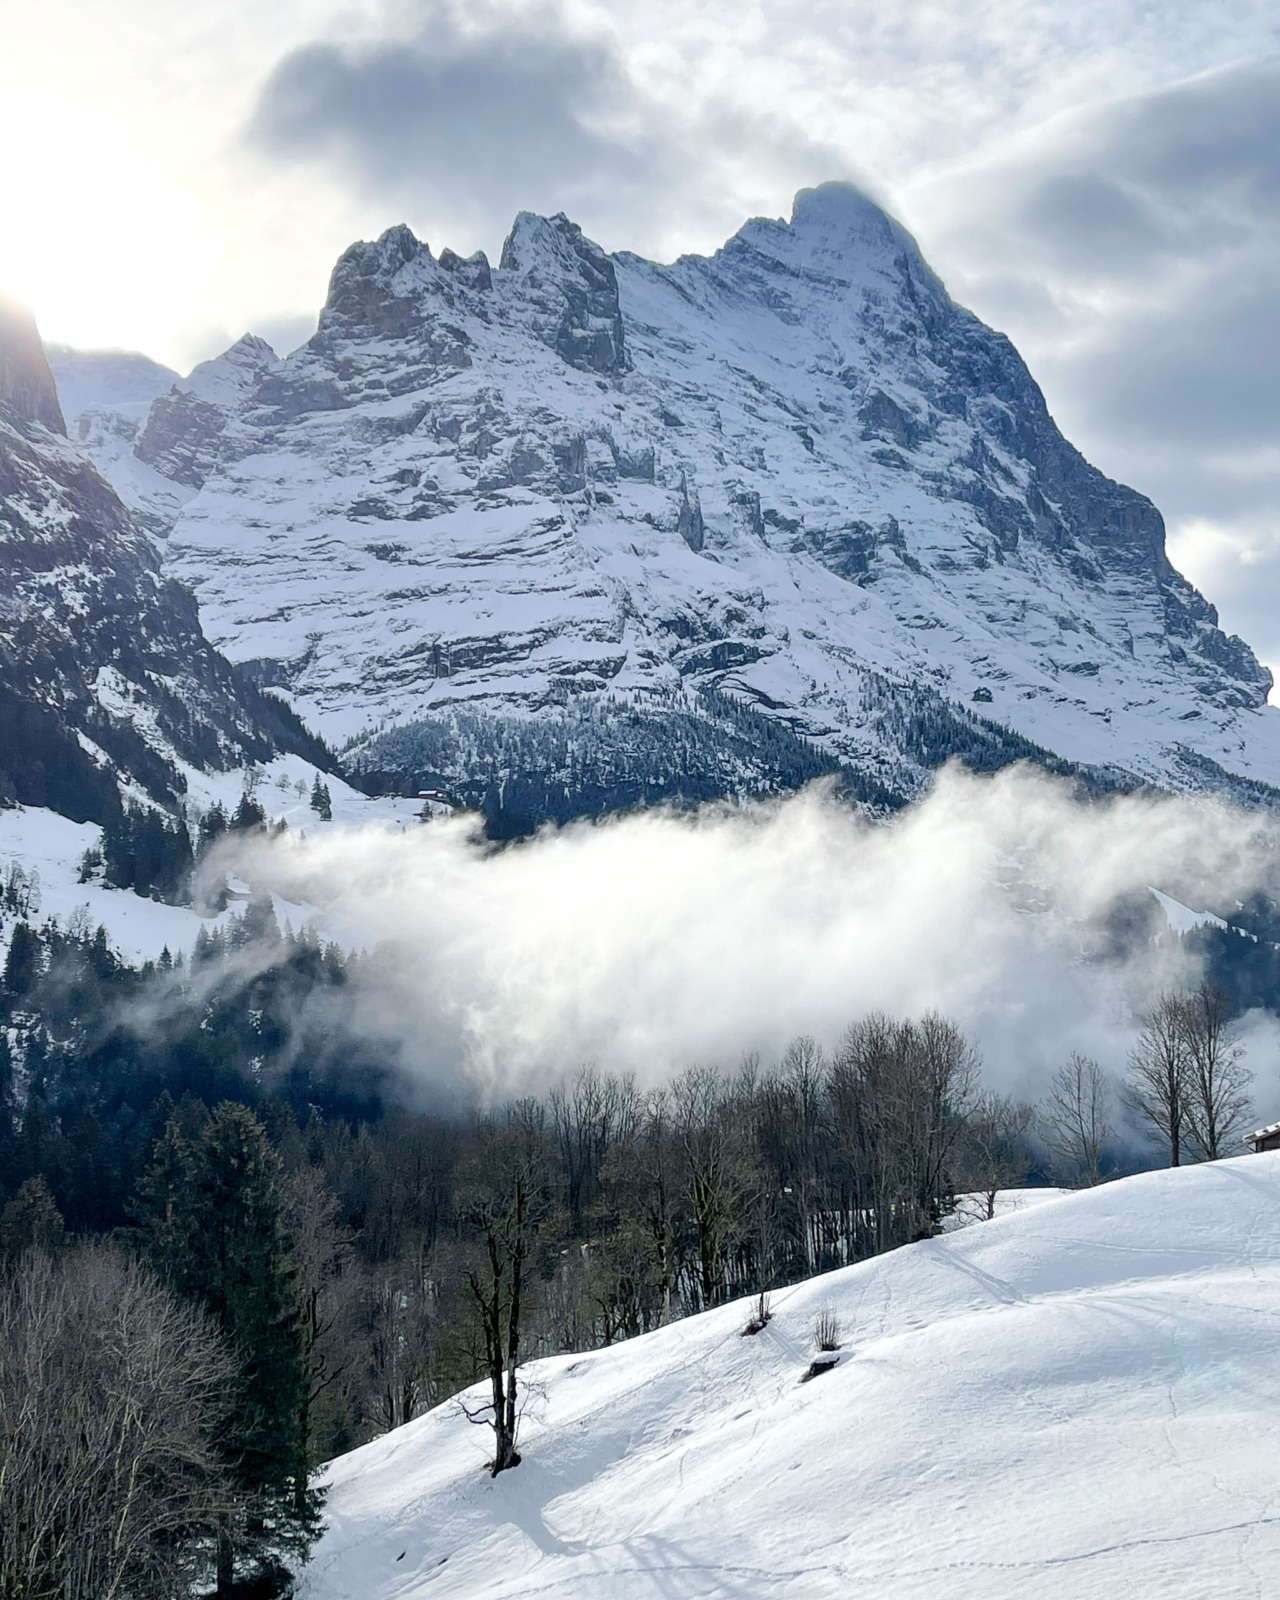 Eiger in winter